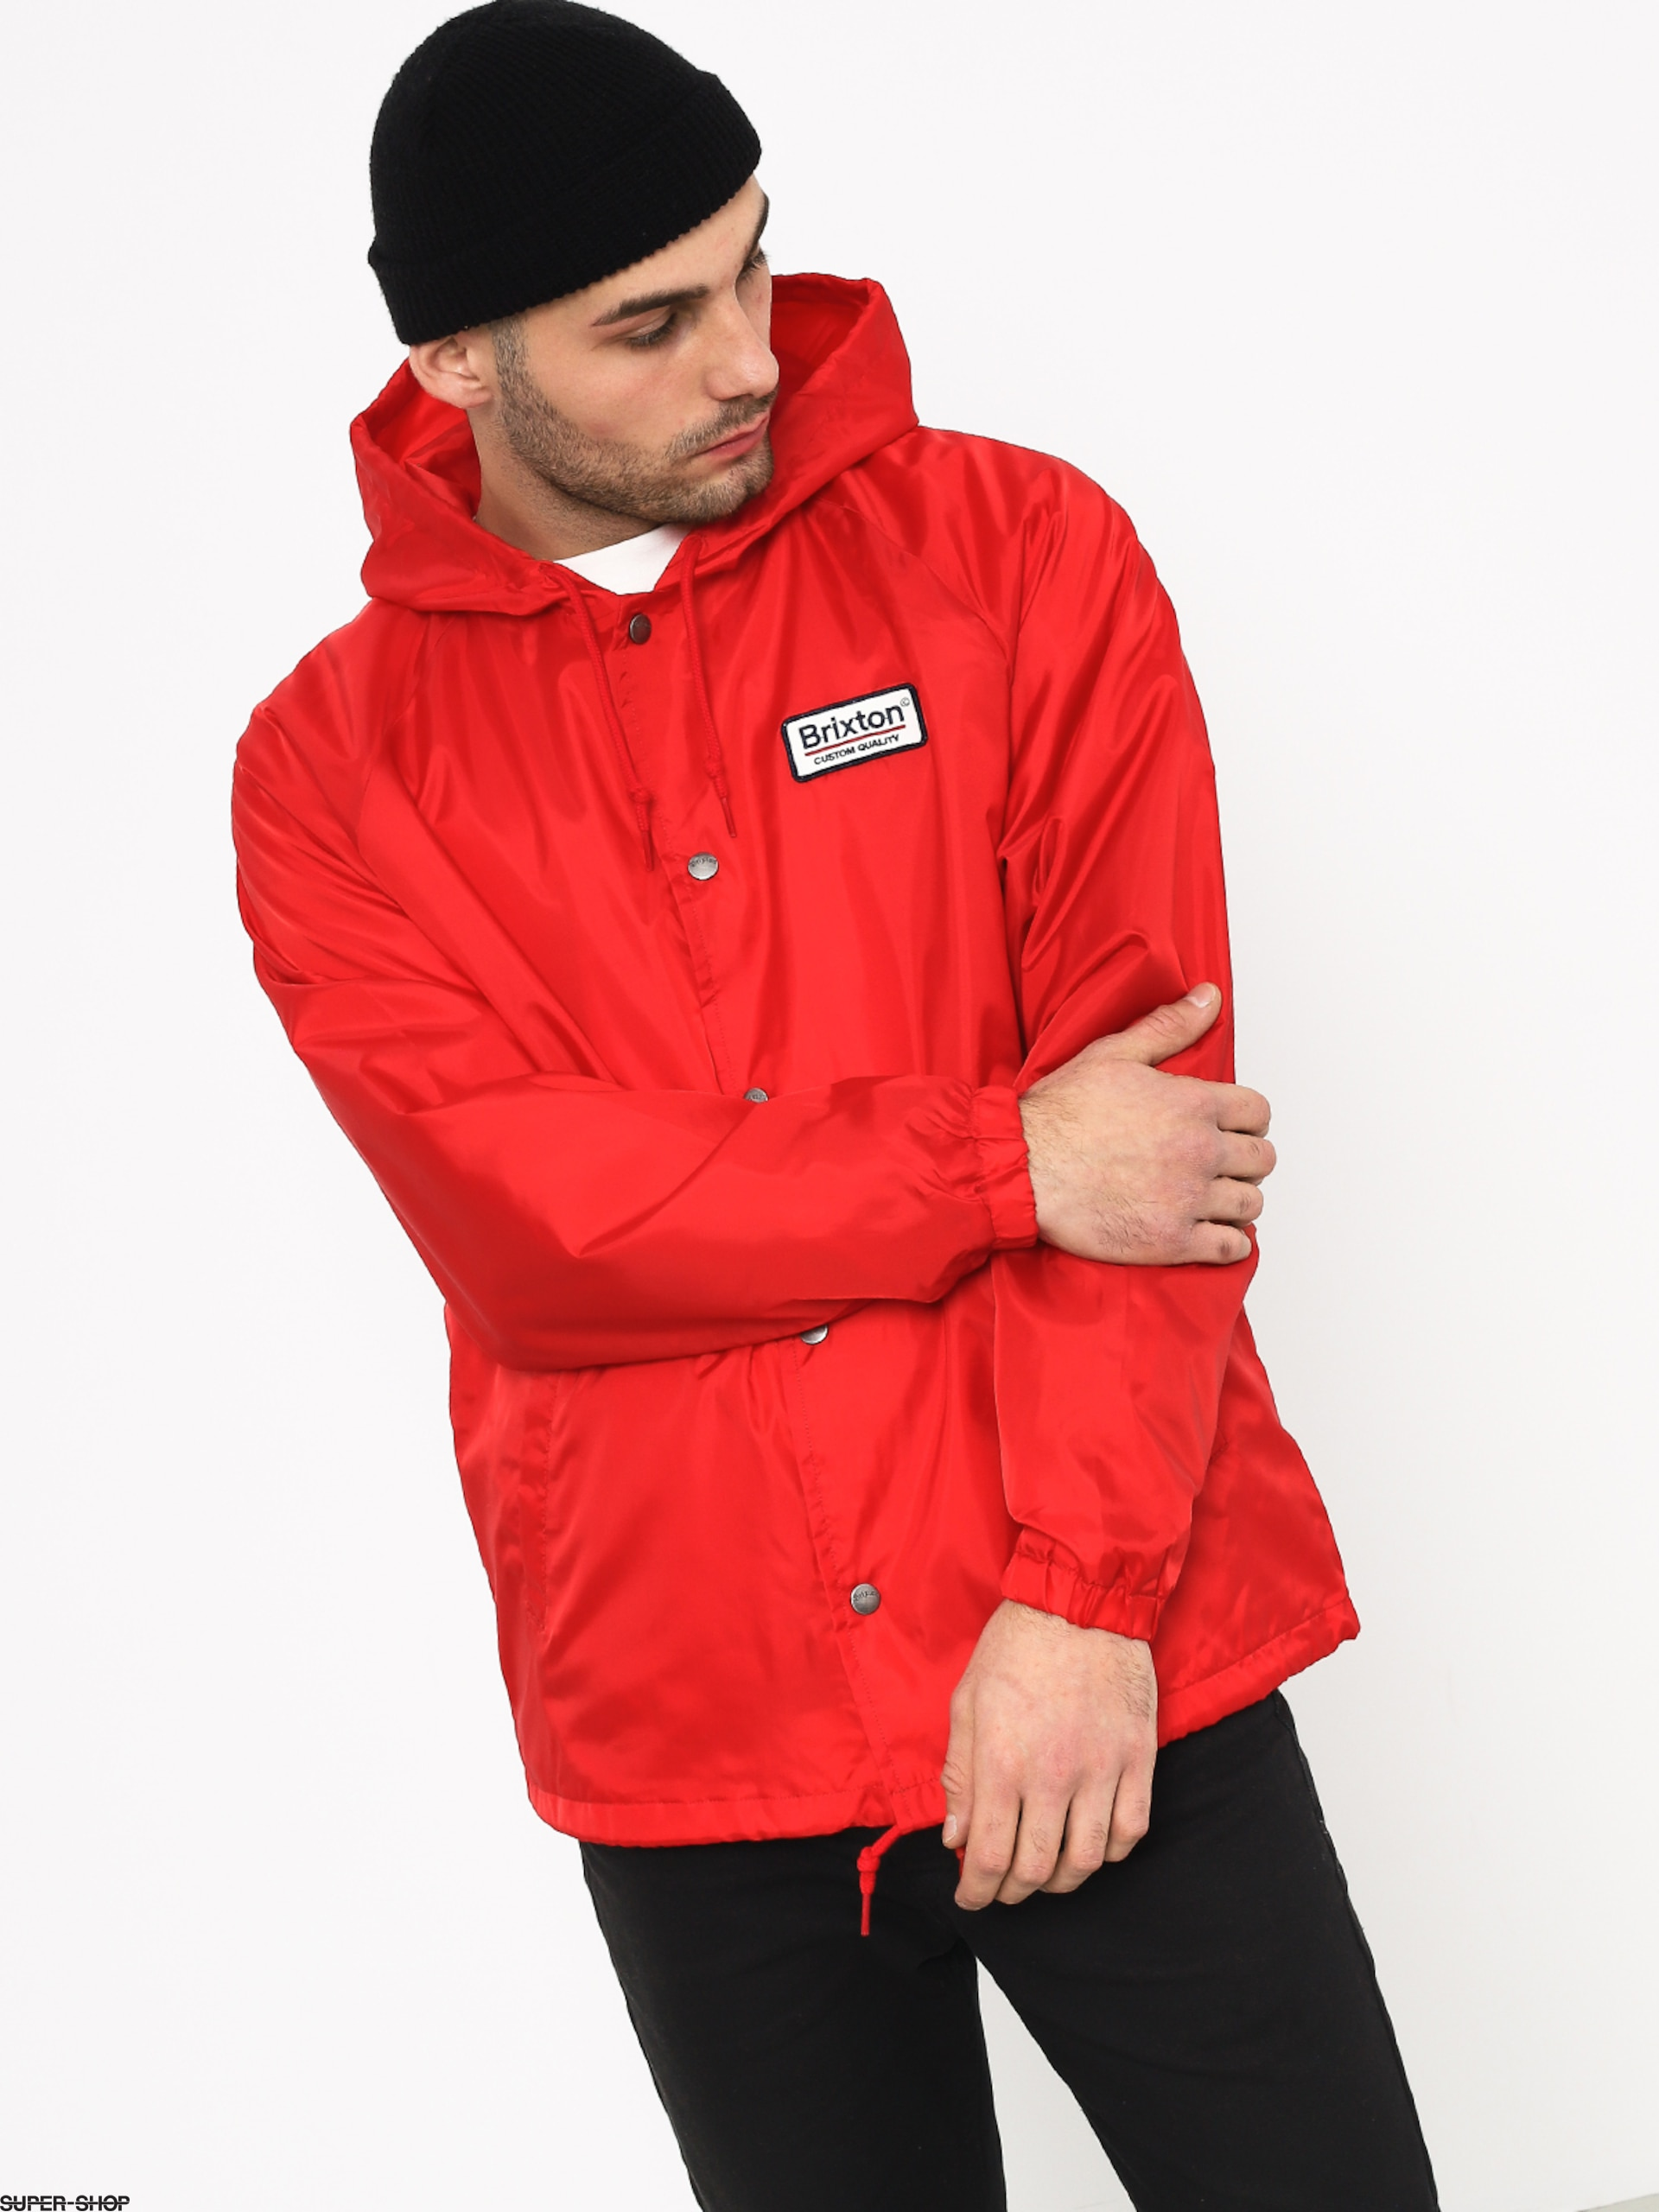 990828-w1920-brixton-palmer-hd-jacket-red-navy.jpg 62006b4c4c2